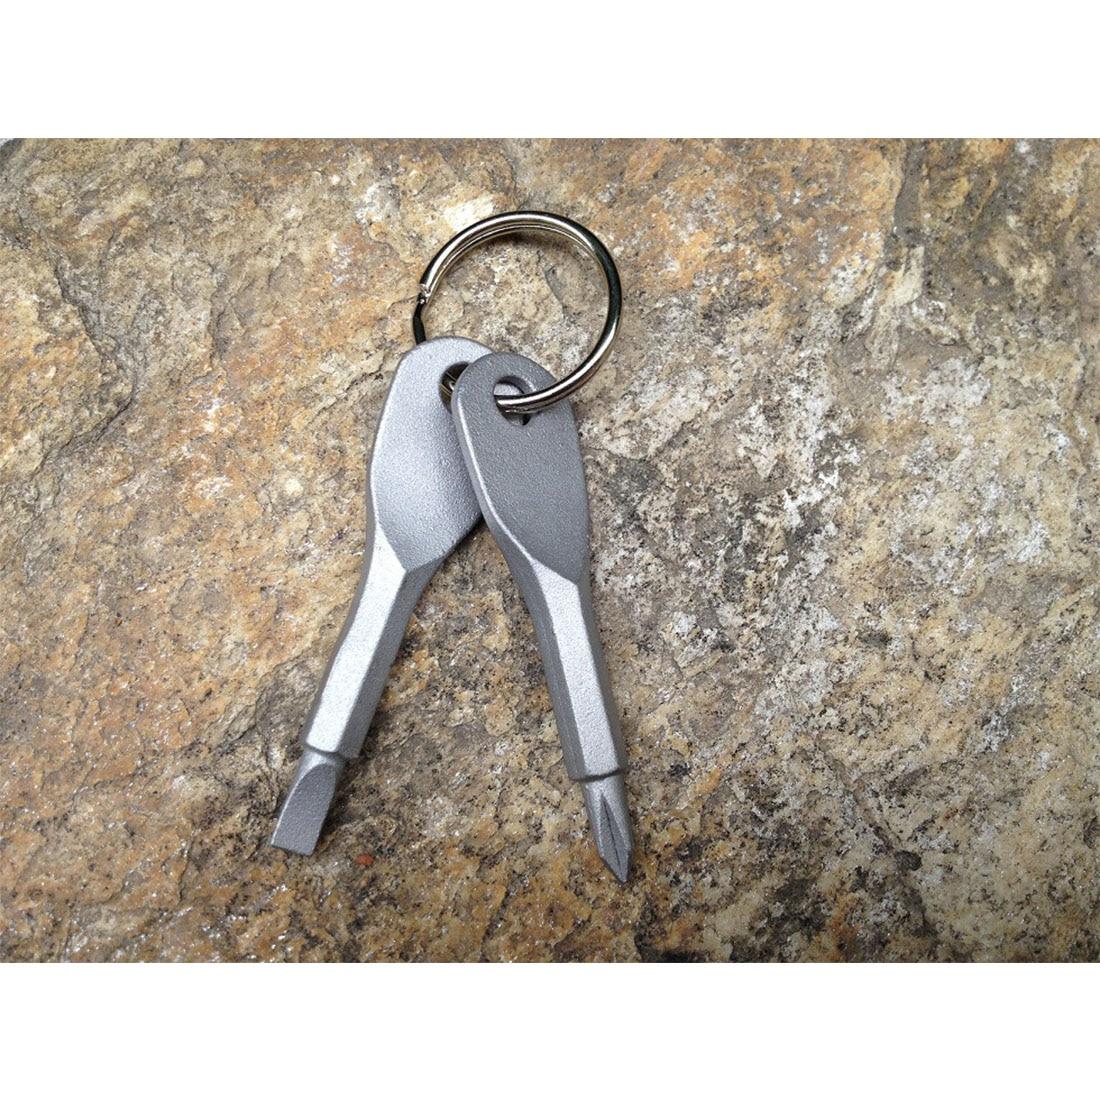 Precision Cast Steel 2pc Mini Slotted Key Shape Screwdrivers